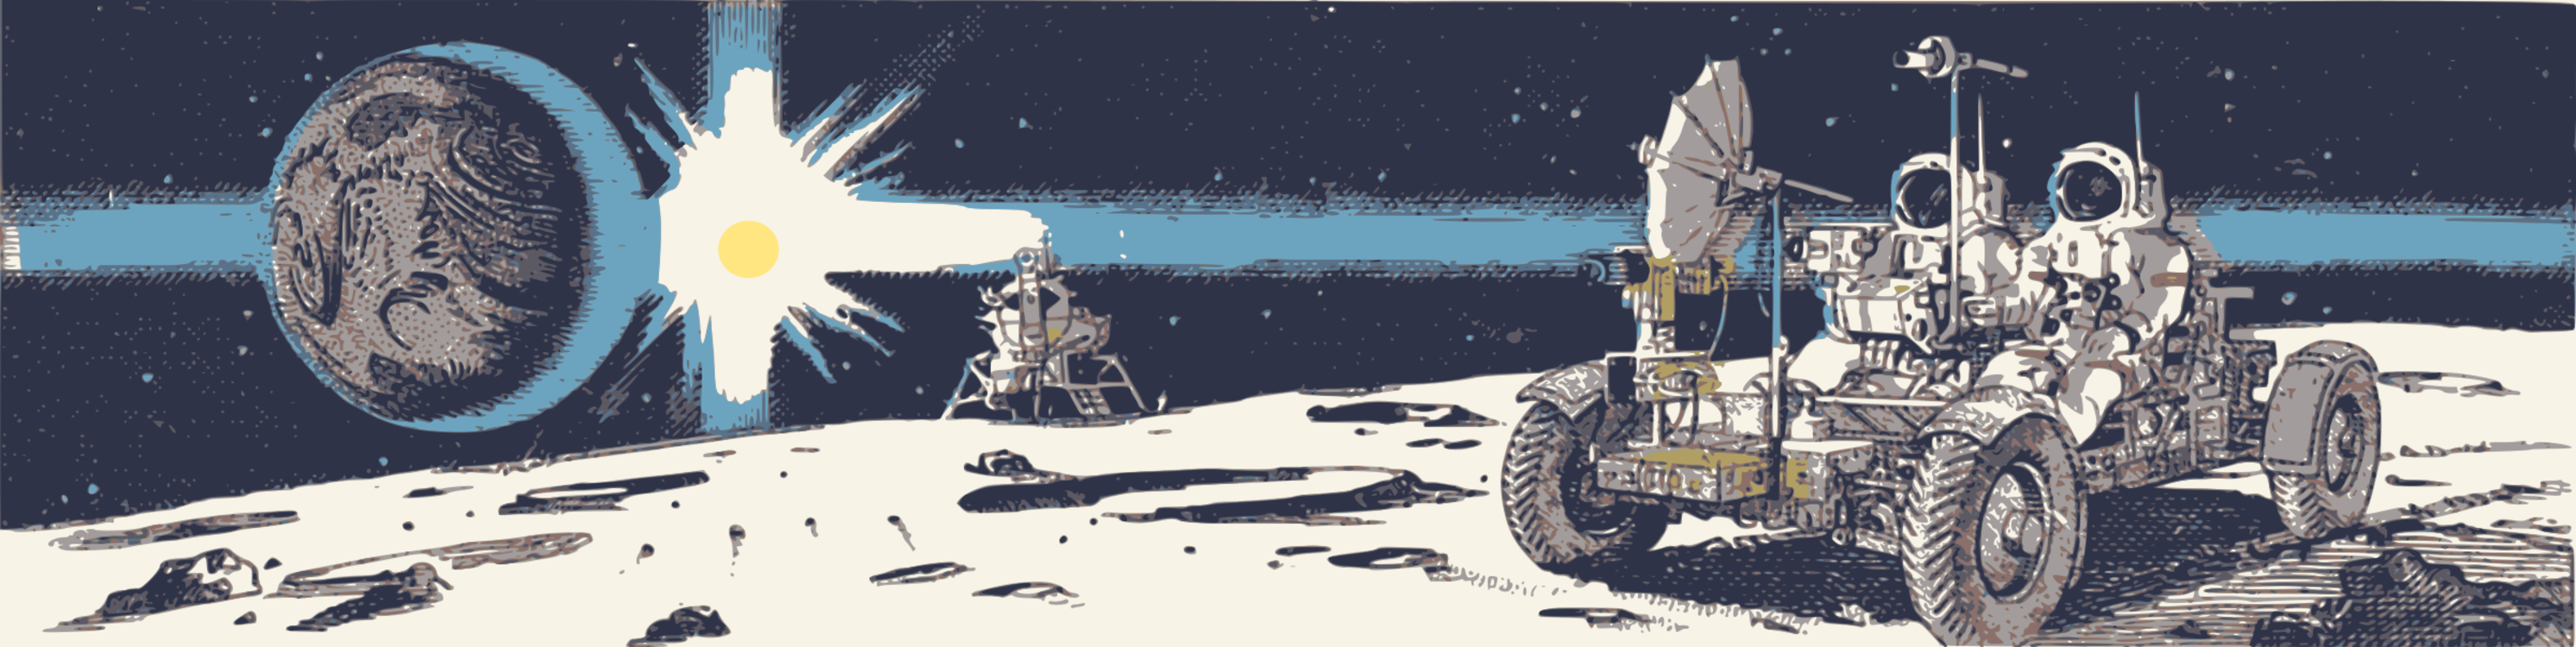 Art,Winter,Space